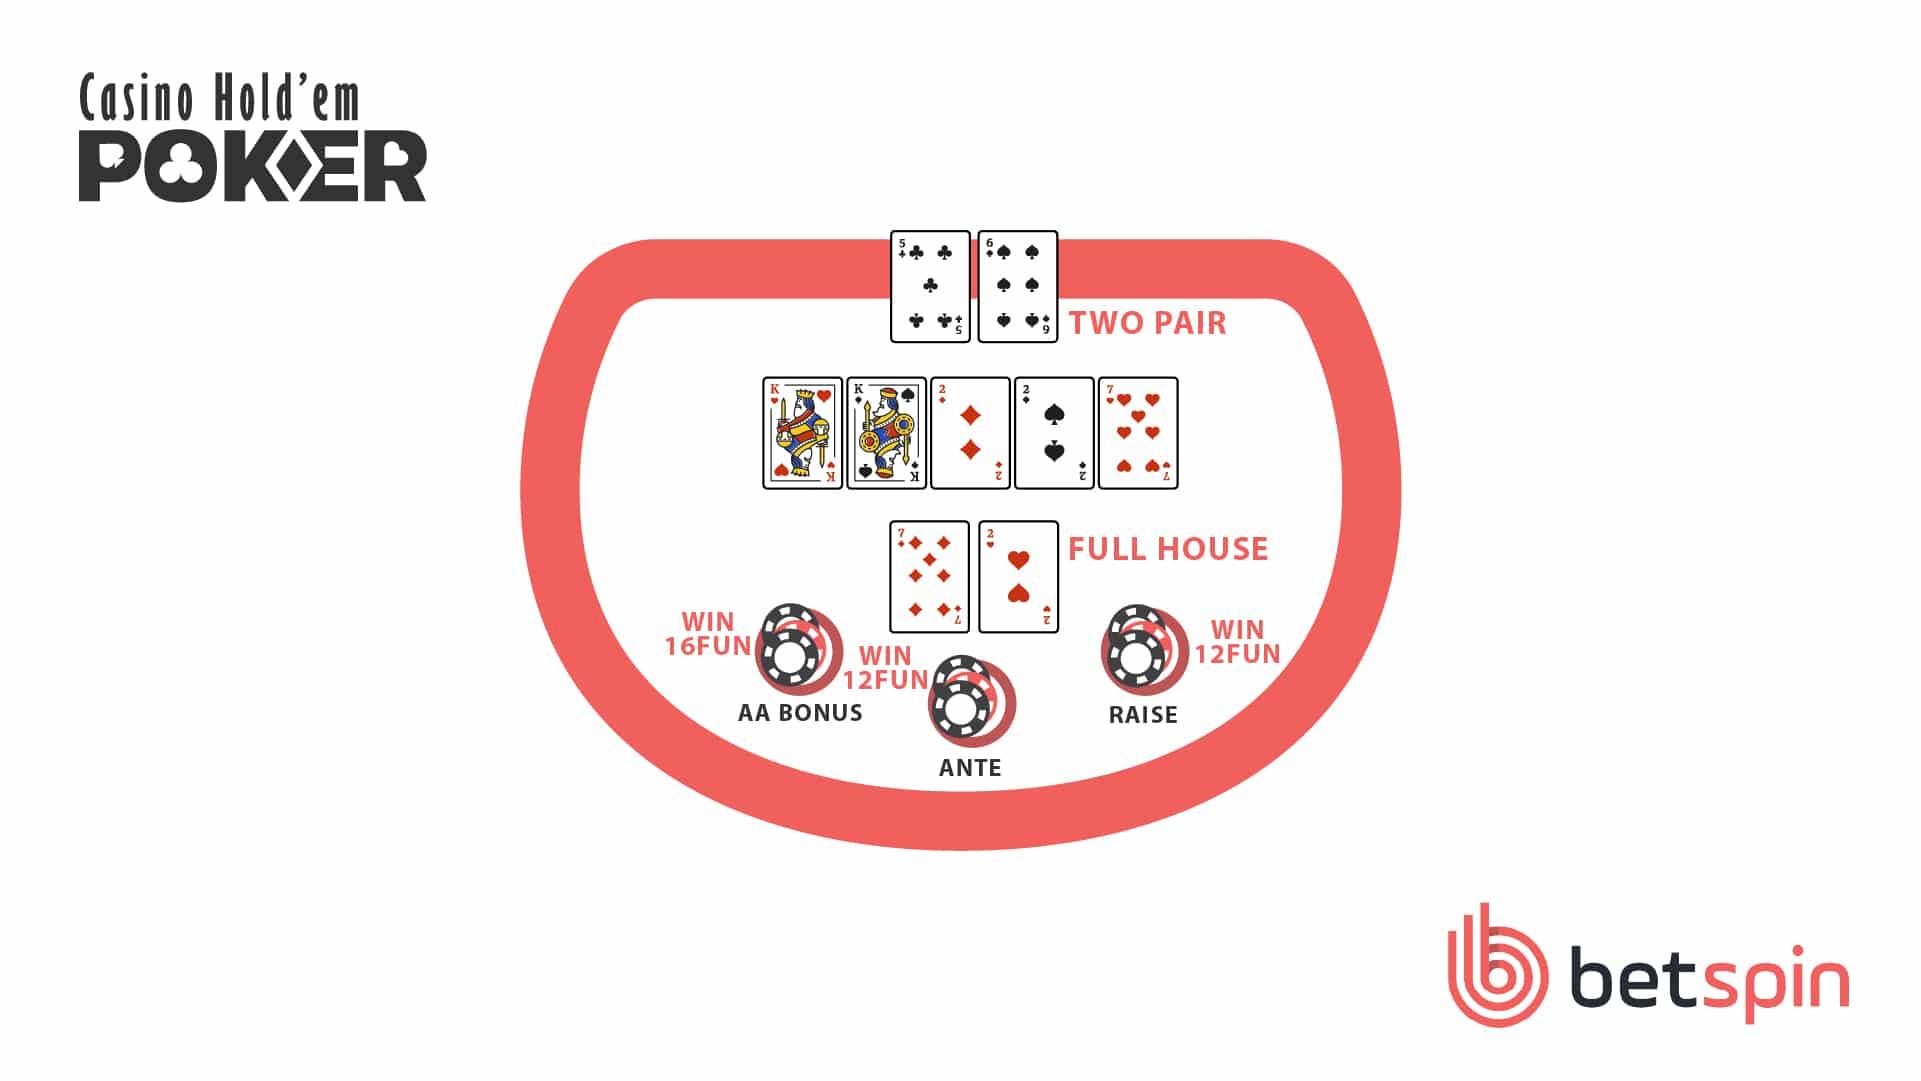 Casino Holdem Step 6